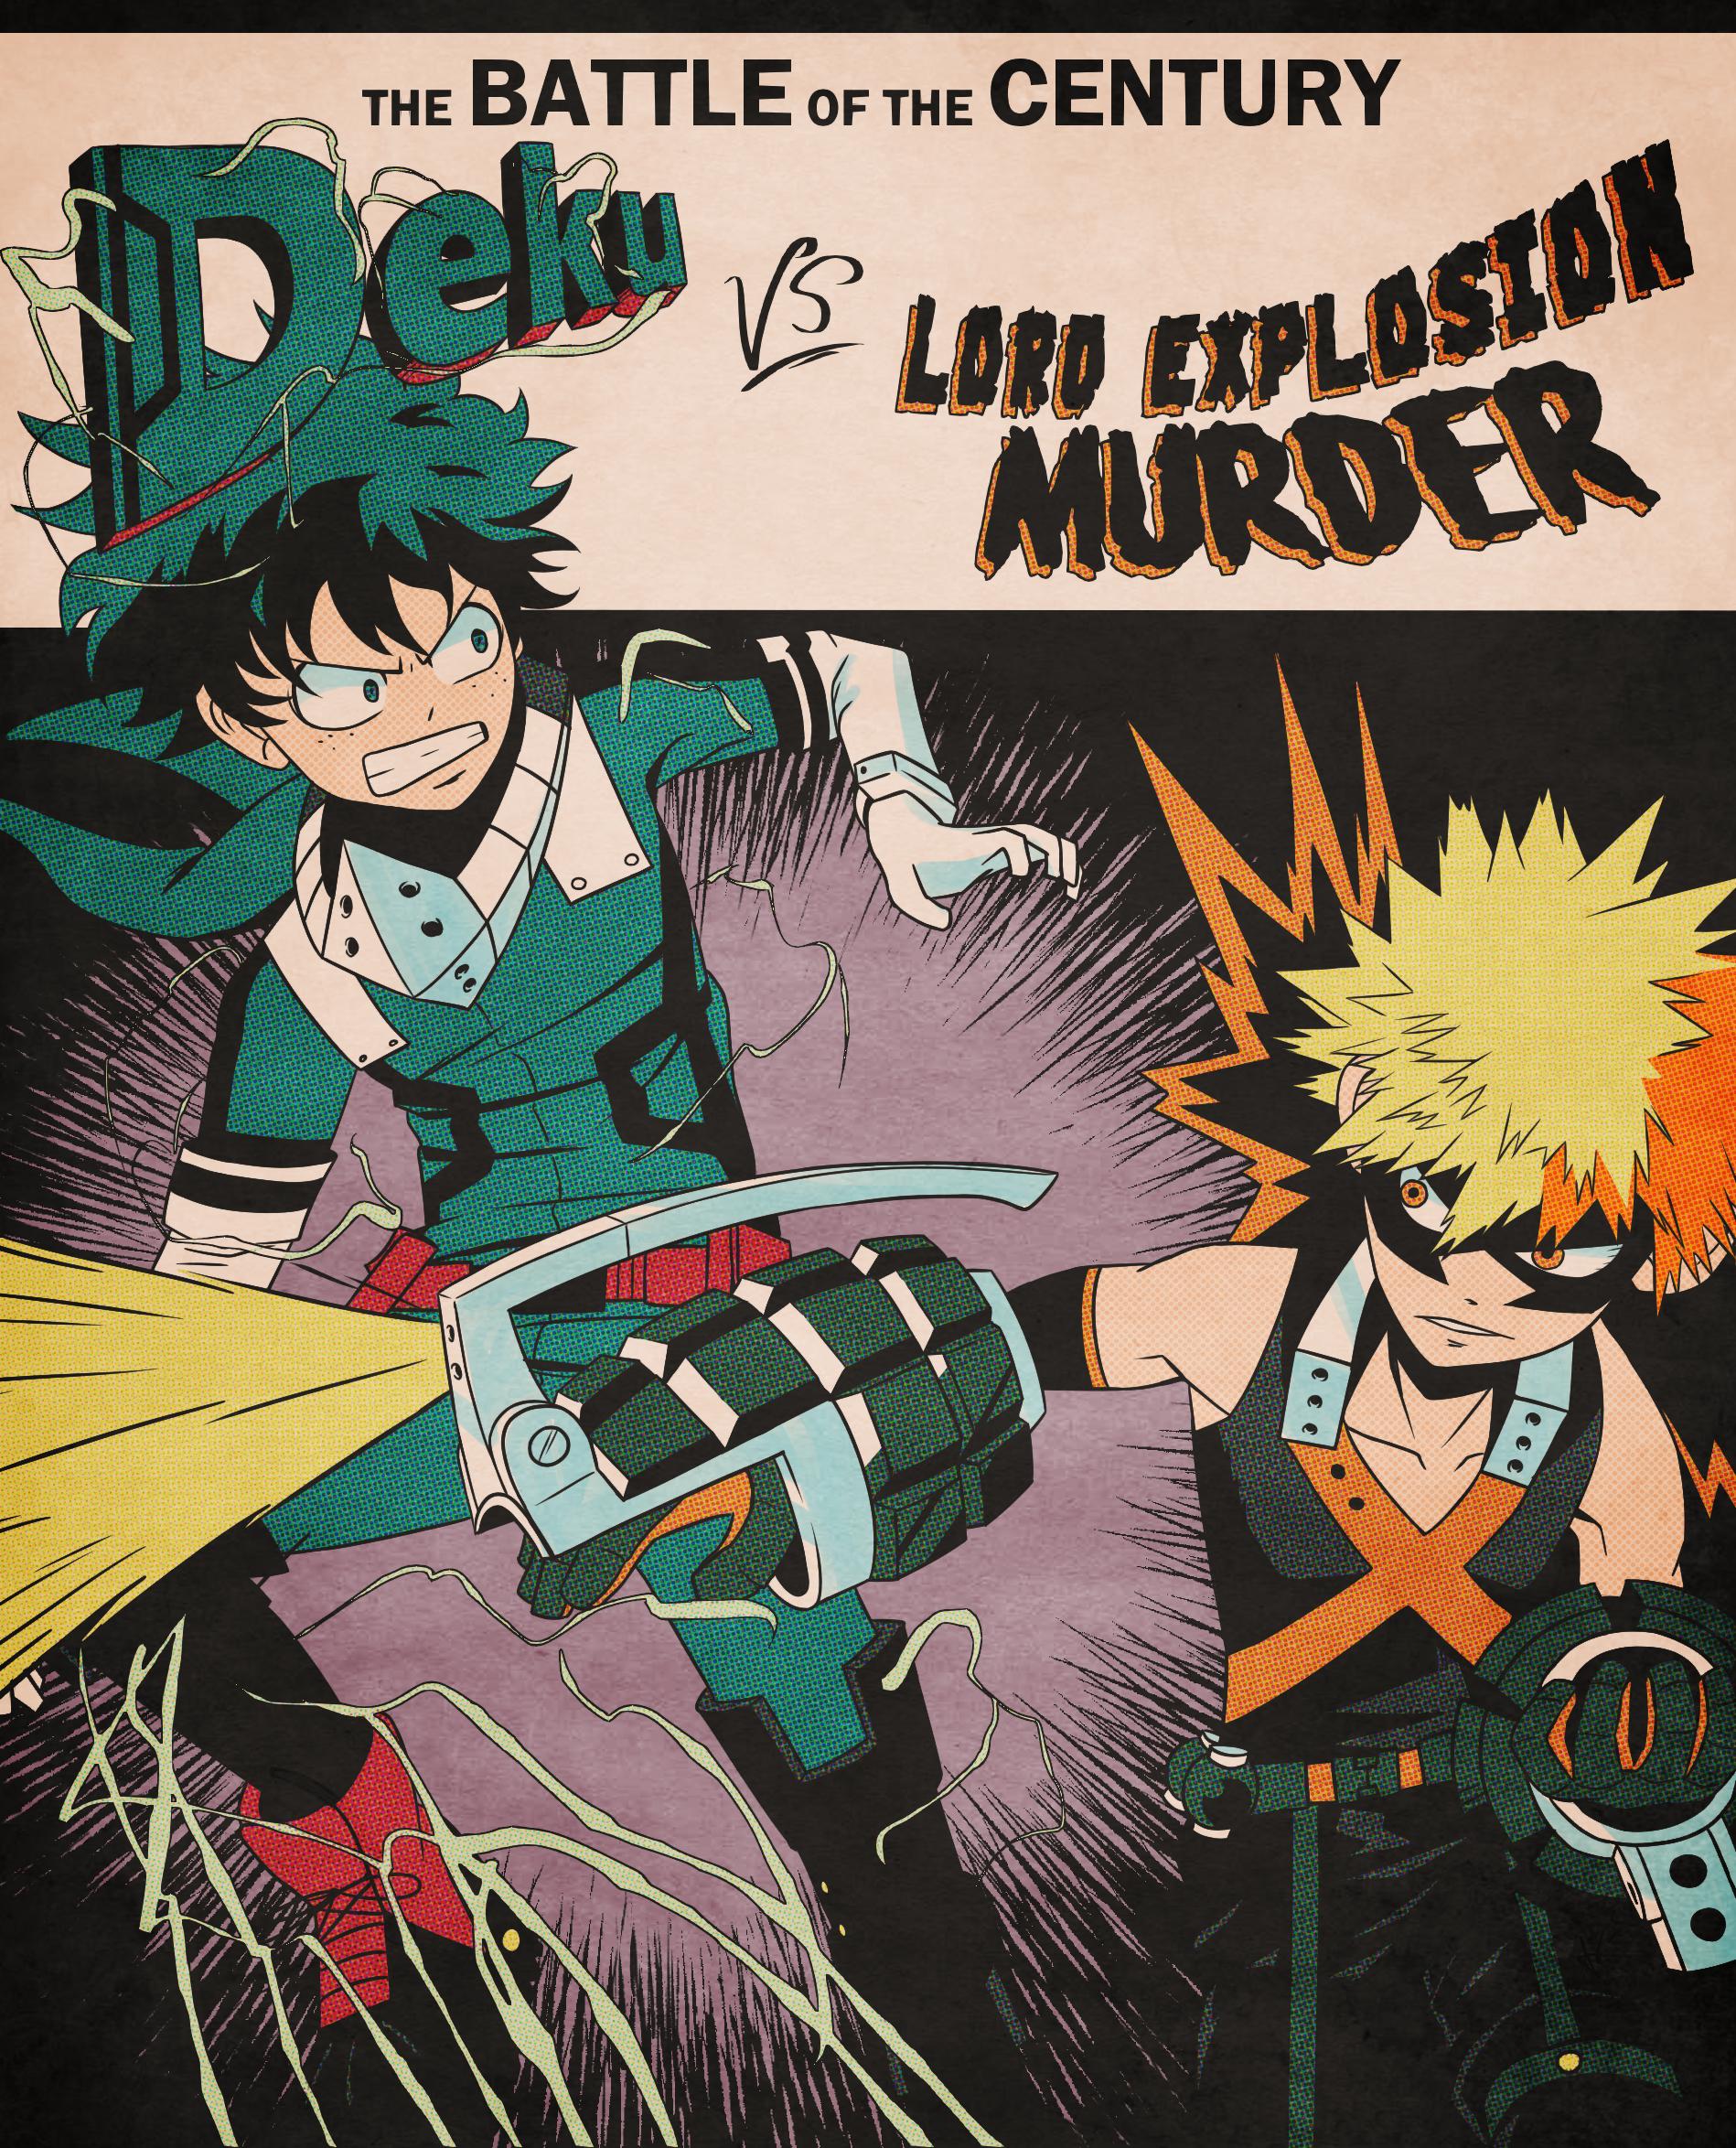 Inktober day 18 - Deku vs Lord Explosion Murder